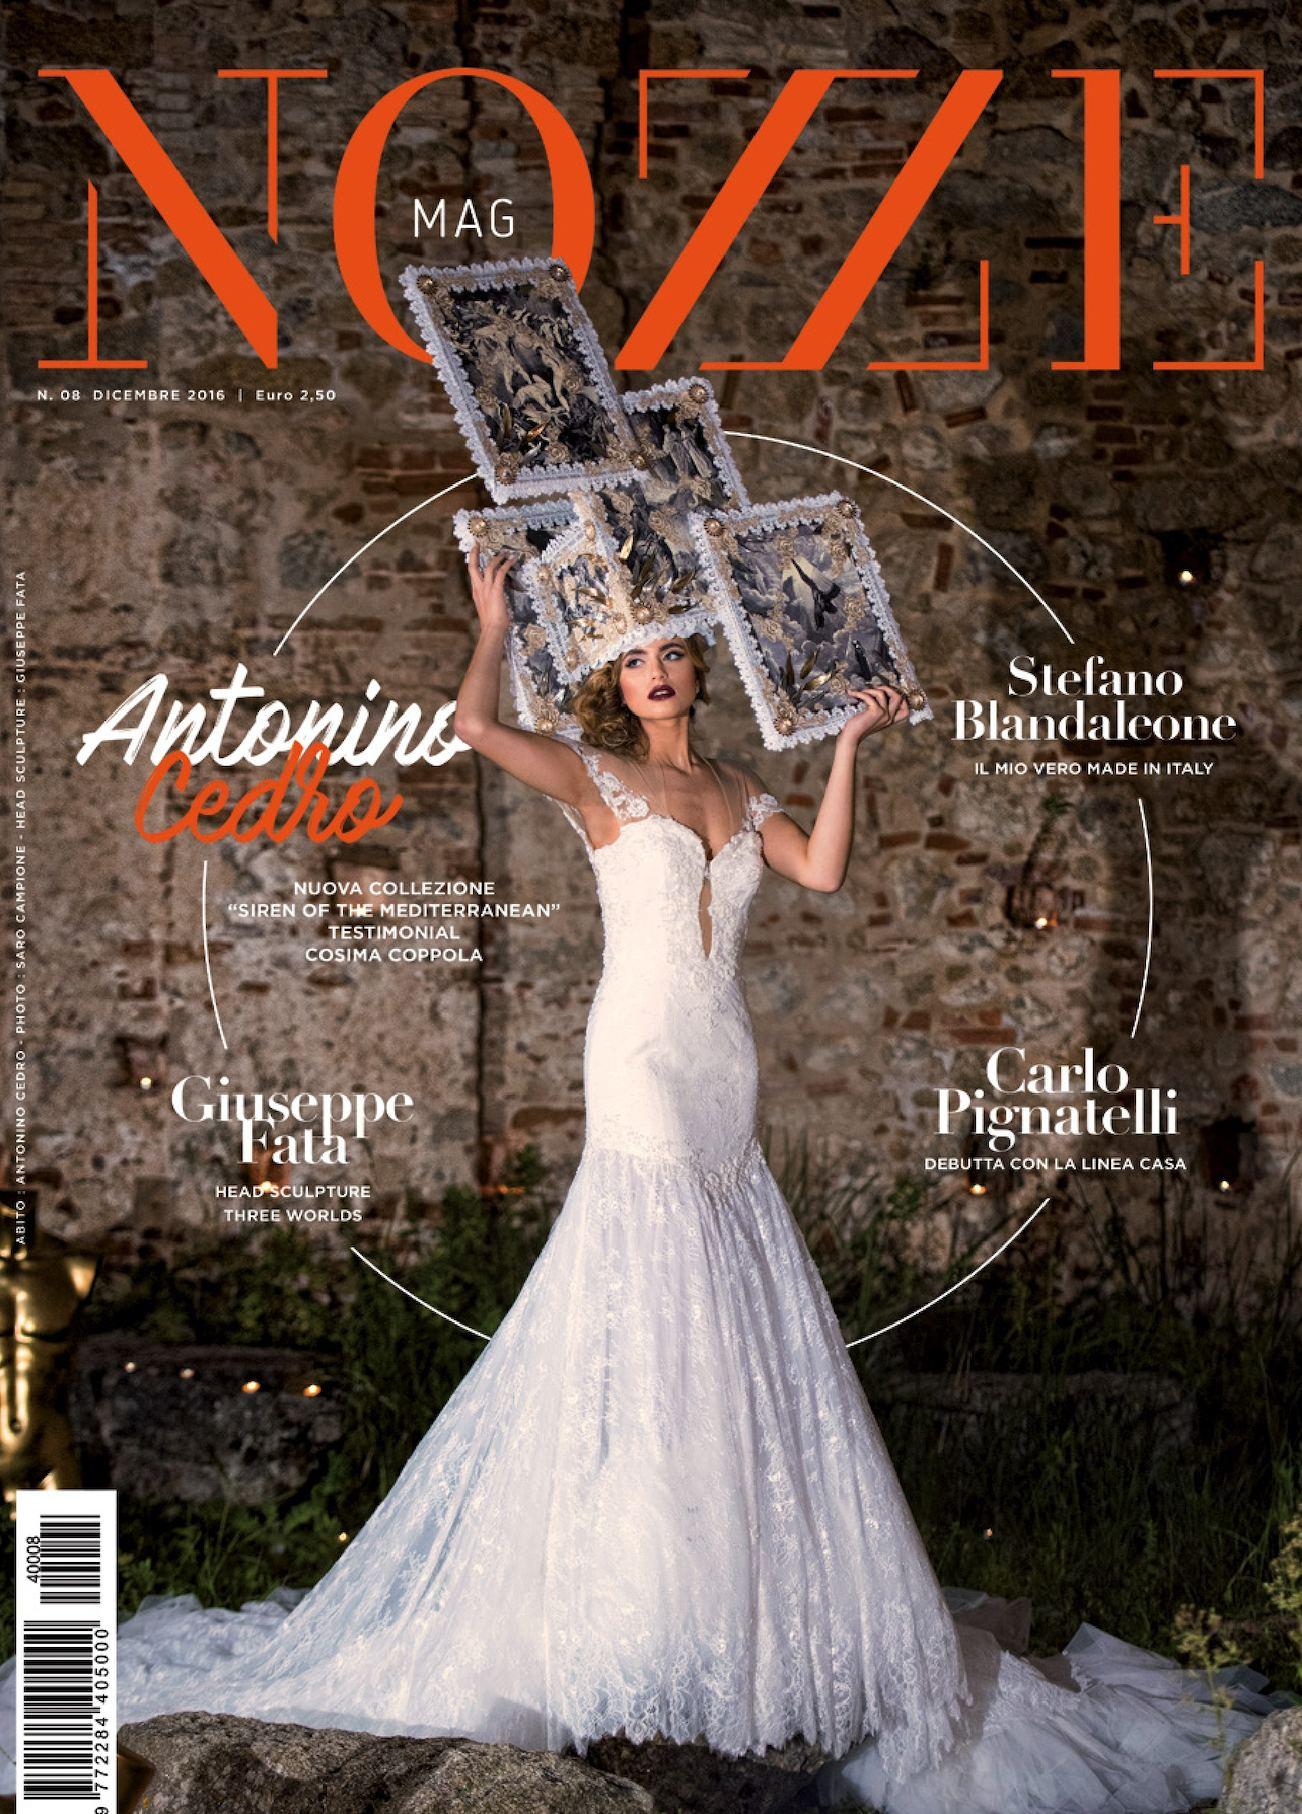 4f4c481be216 Calaméo - Nozze Mag Dicembre 2016